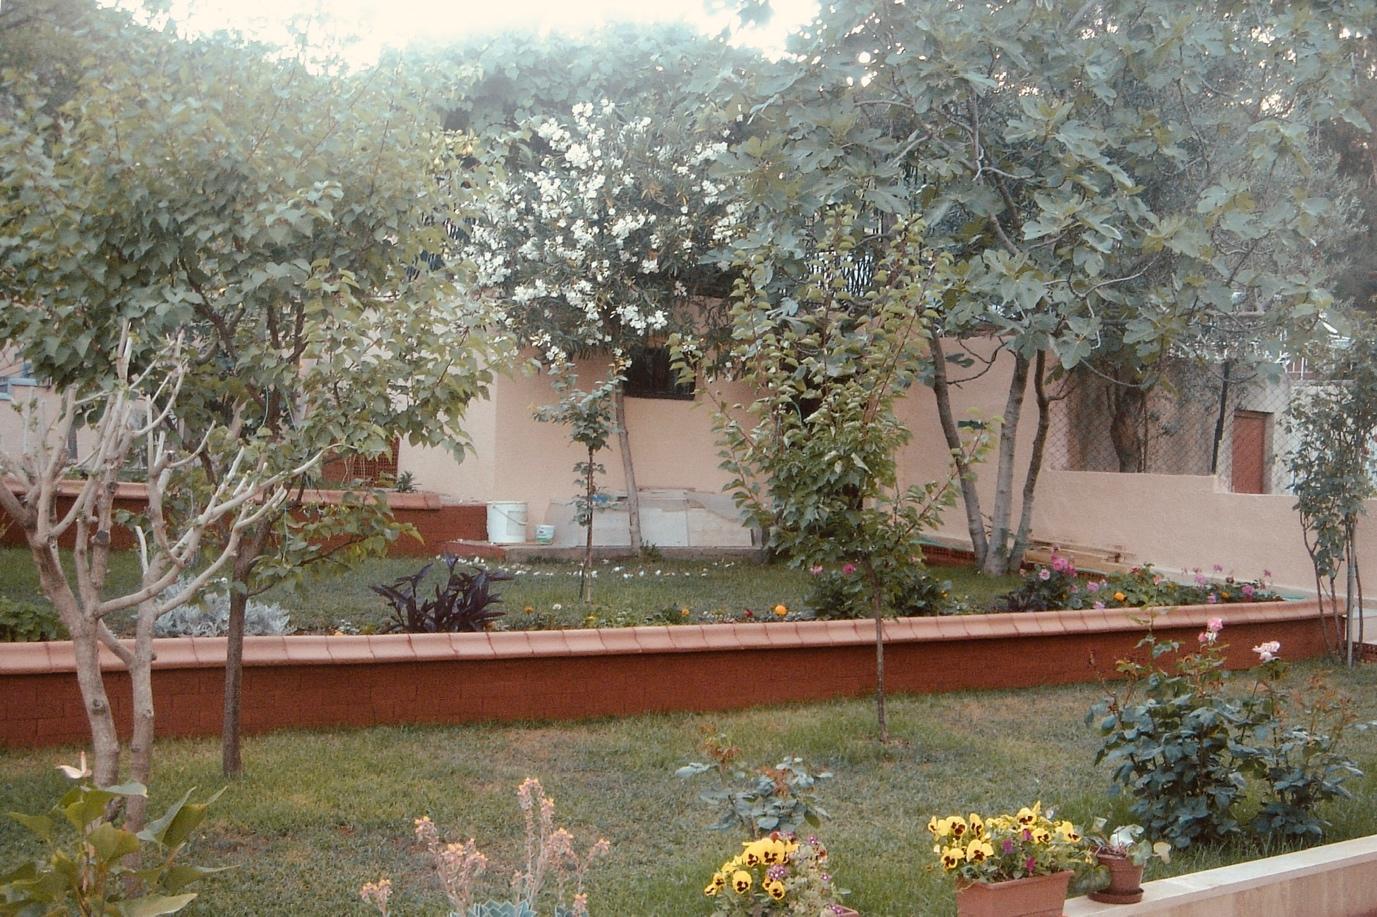 Bedri Azak's garden, Turkey, 5th July 2006